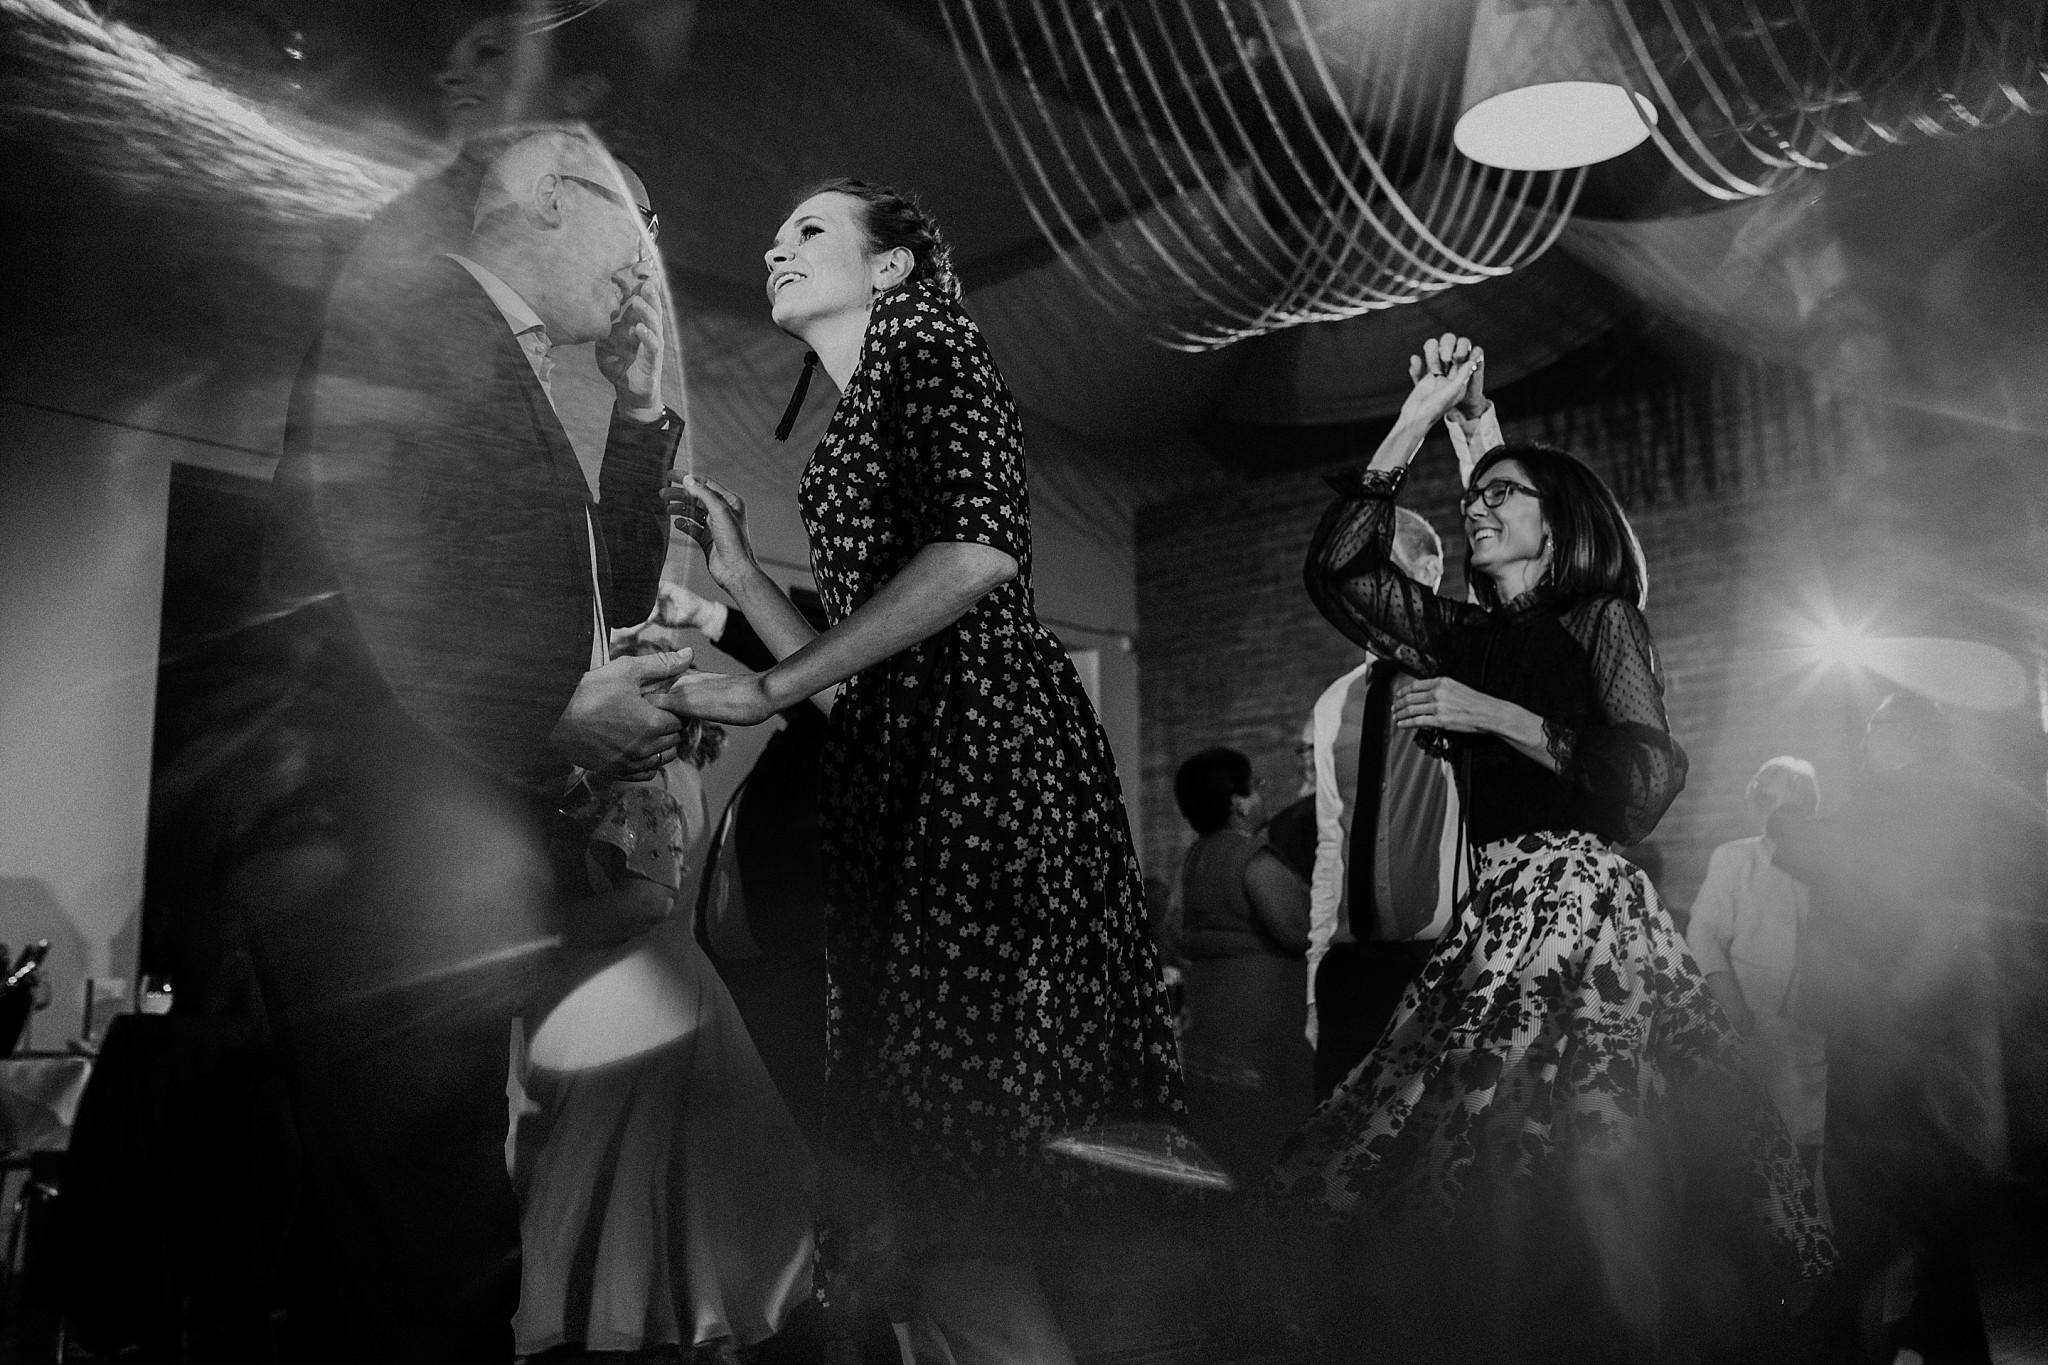 fotograf poznan wesele dobra truskawka piekne wesele pod poznaniem wesele w dobrej truskawce piekna para mloda slub marzen slub koronawirus slub listopad wesele koronawirus 419